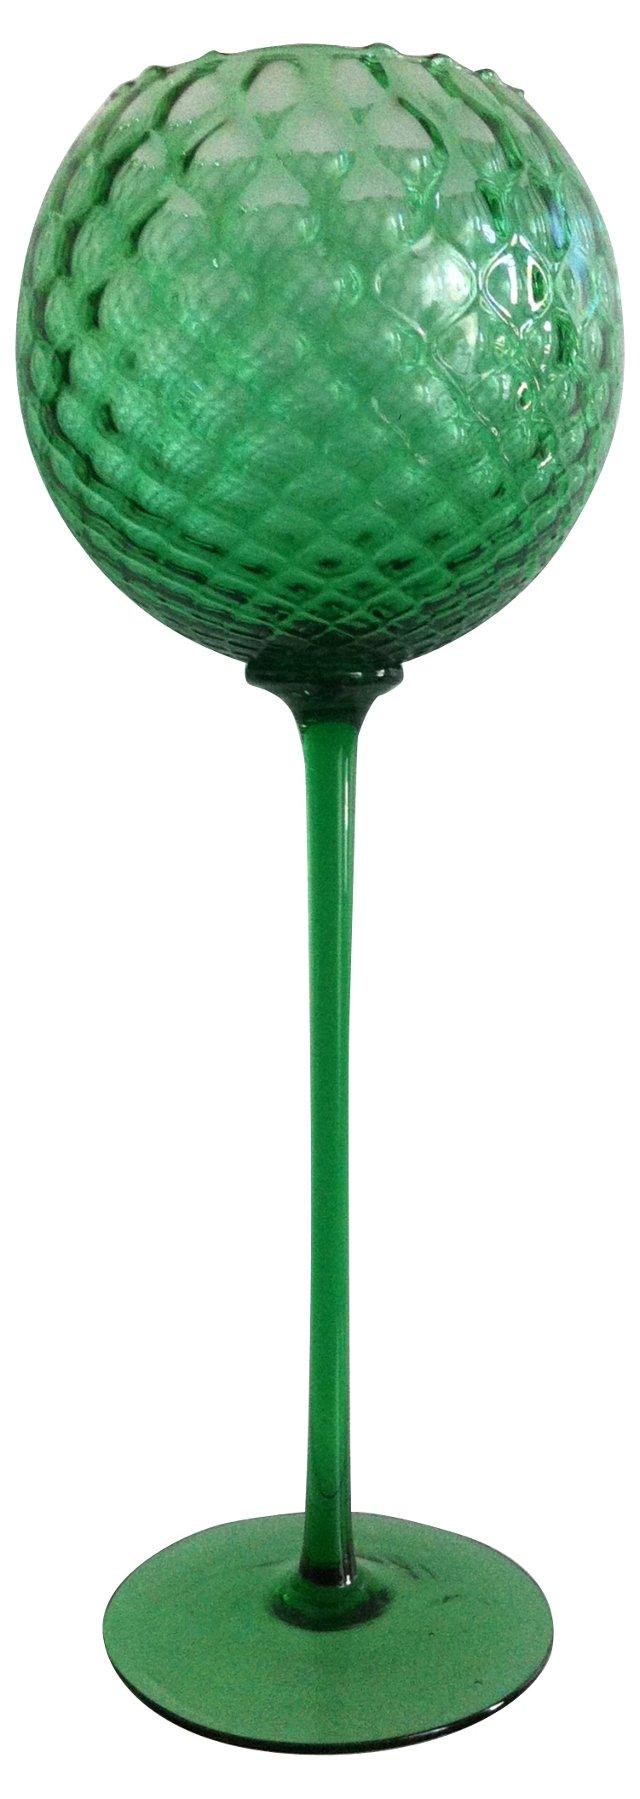 Tall Mint Green Optic Goblet